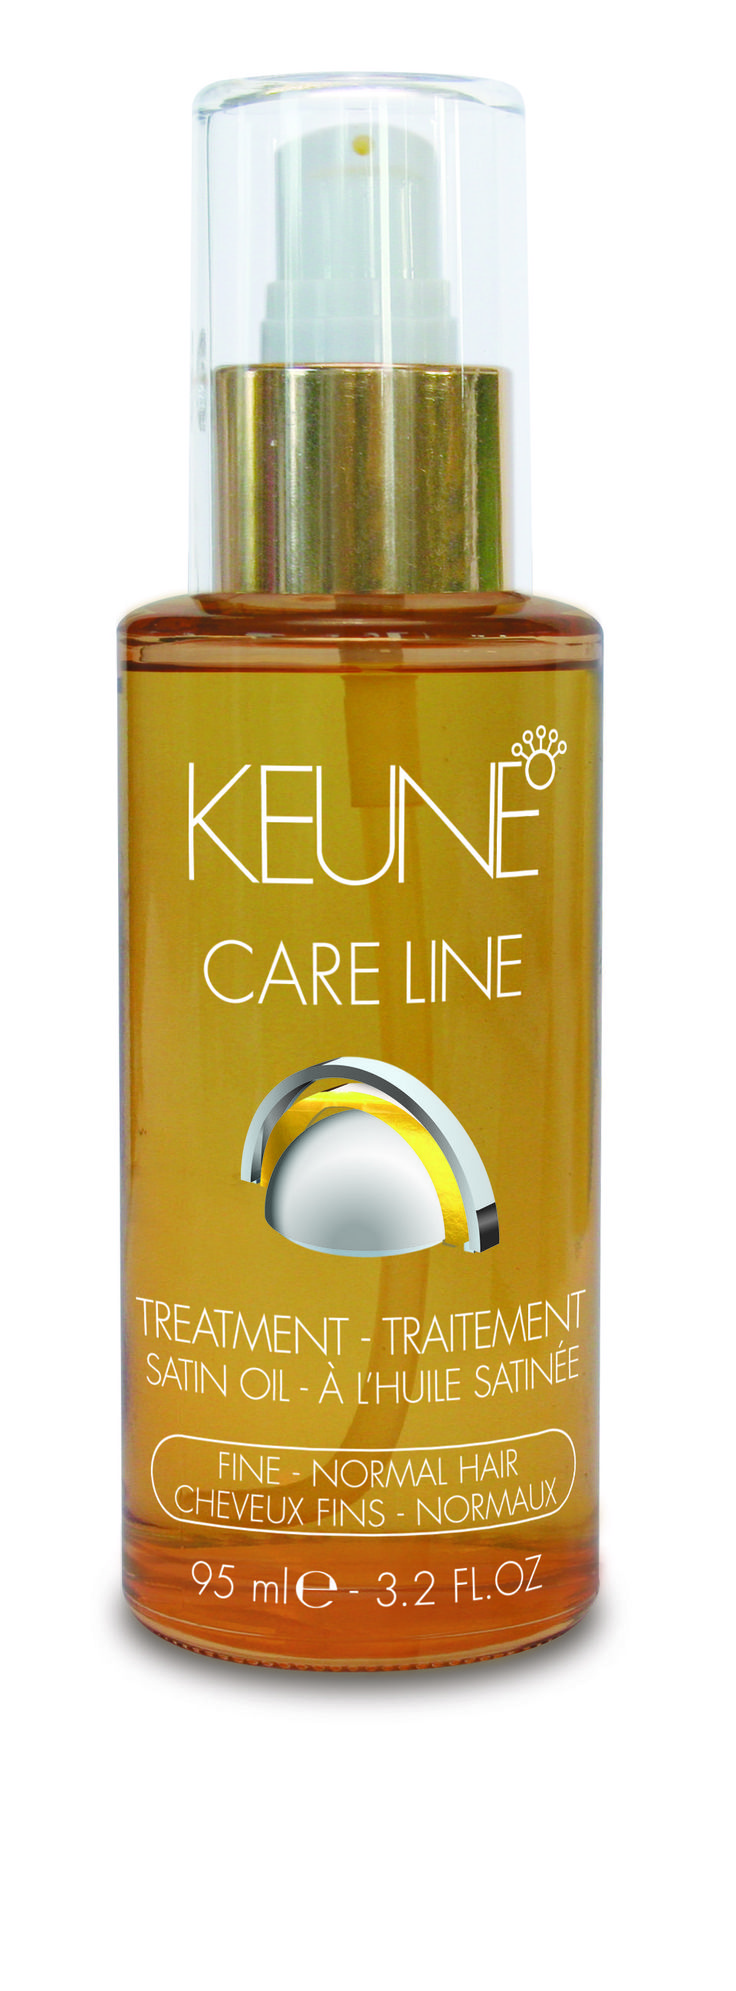 Care Line Satin Oil Treatment